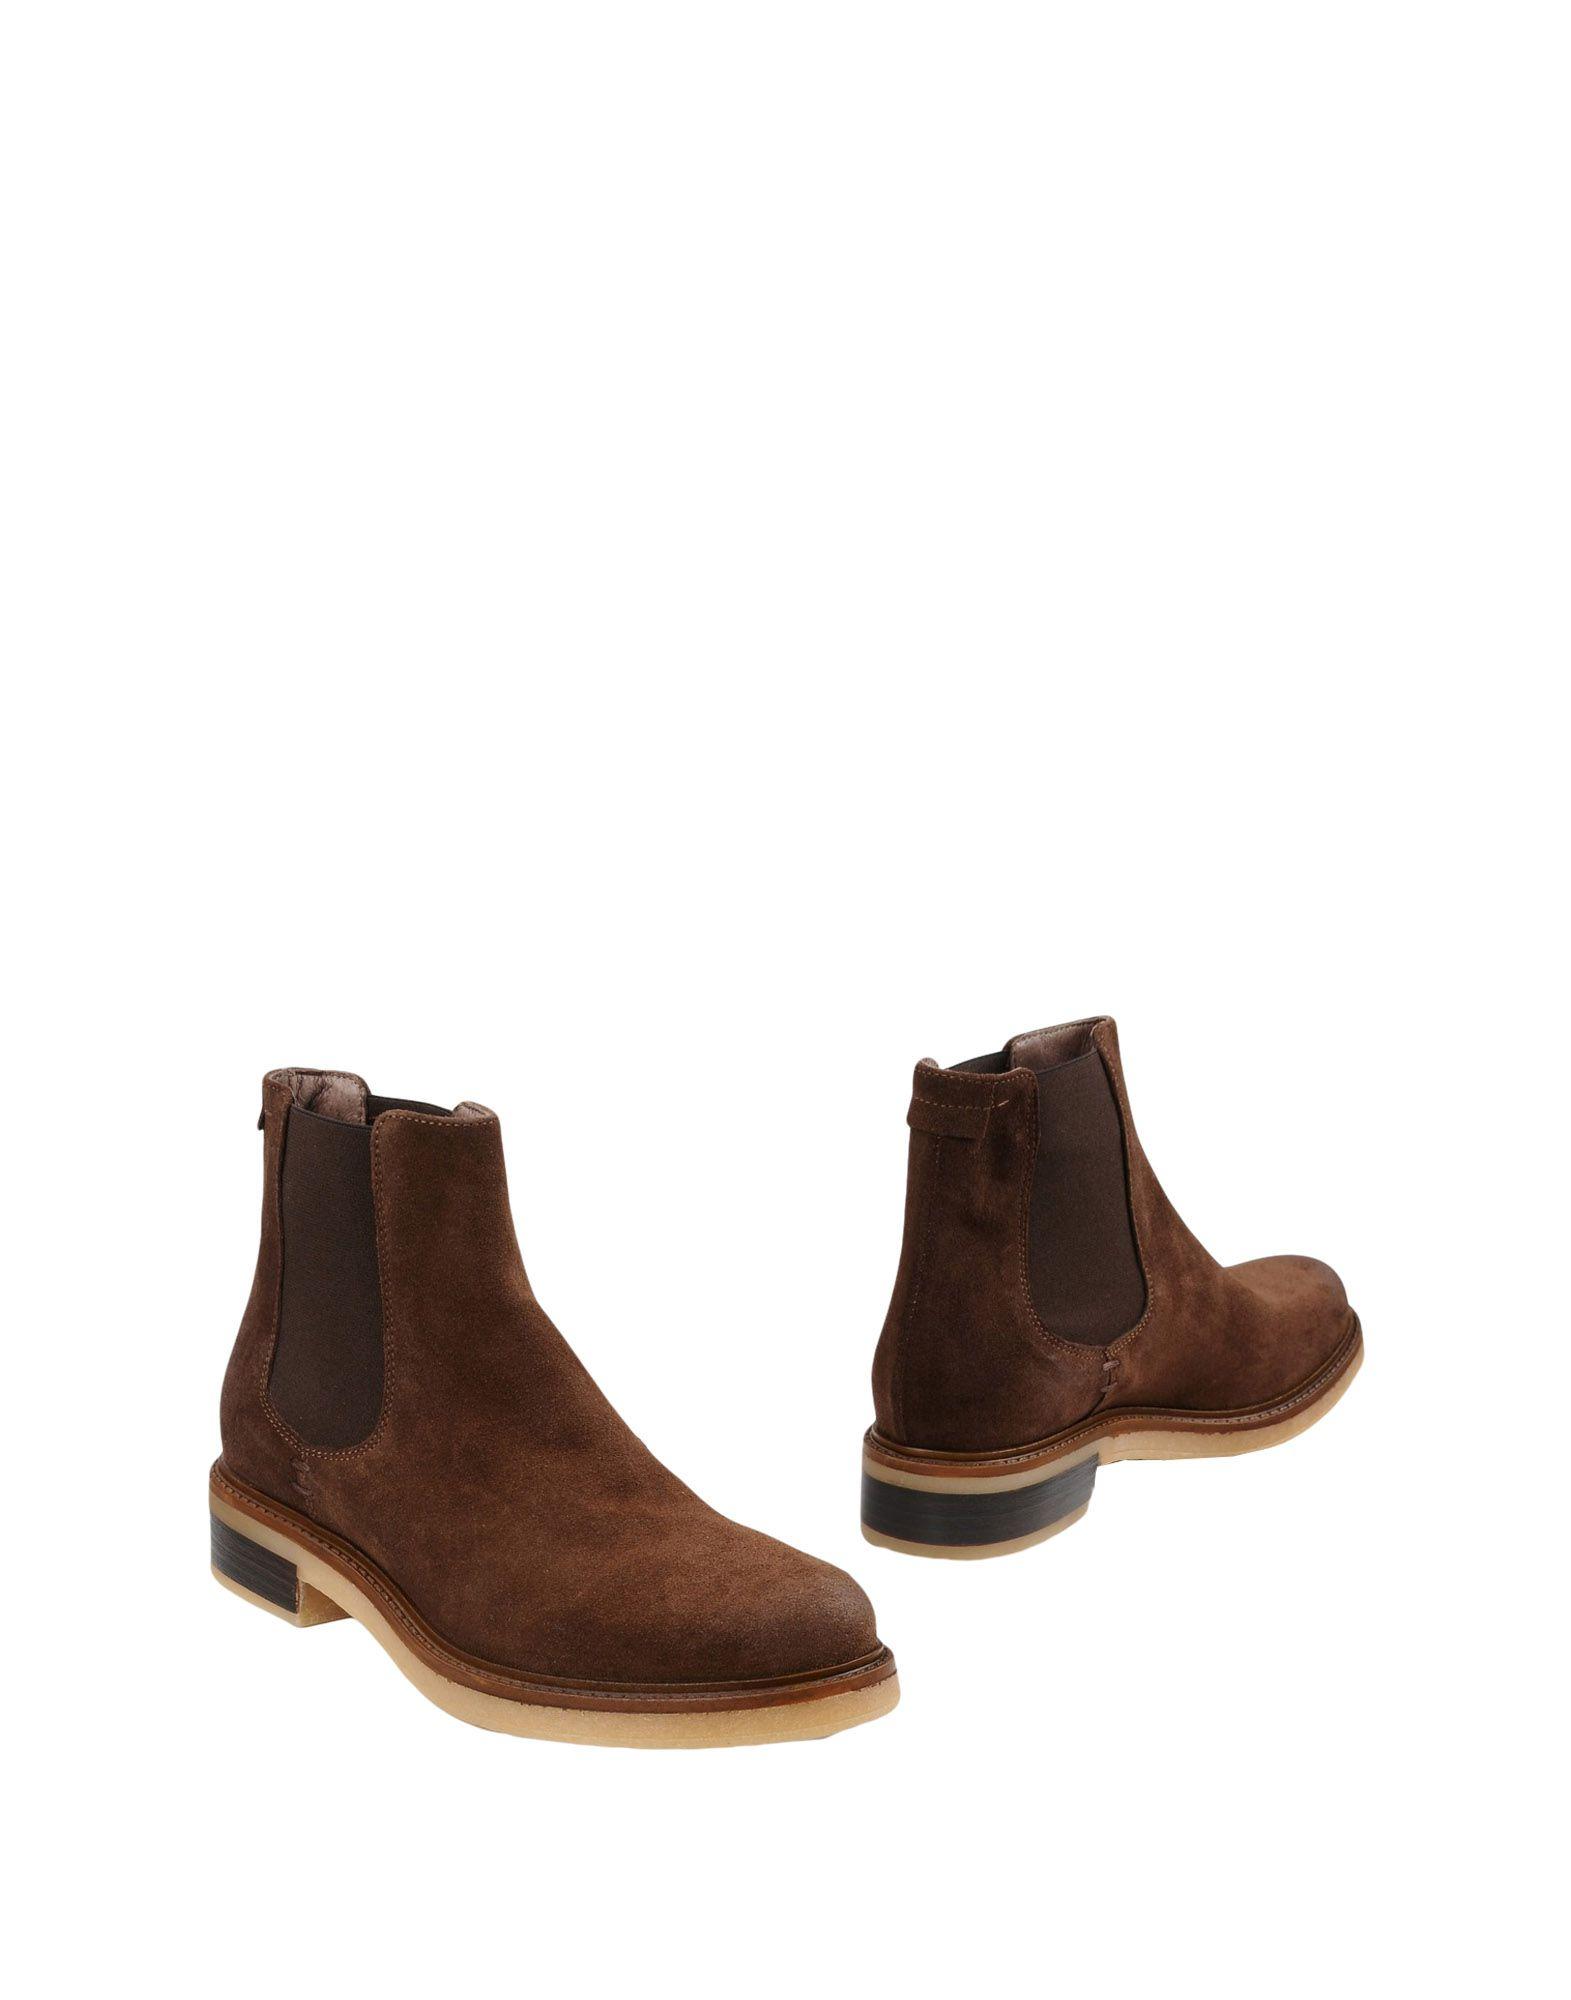 Chelsea Boots 11317422JN Leonardo Principi Donna - 11317422JN Boots 9436e1